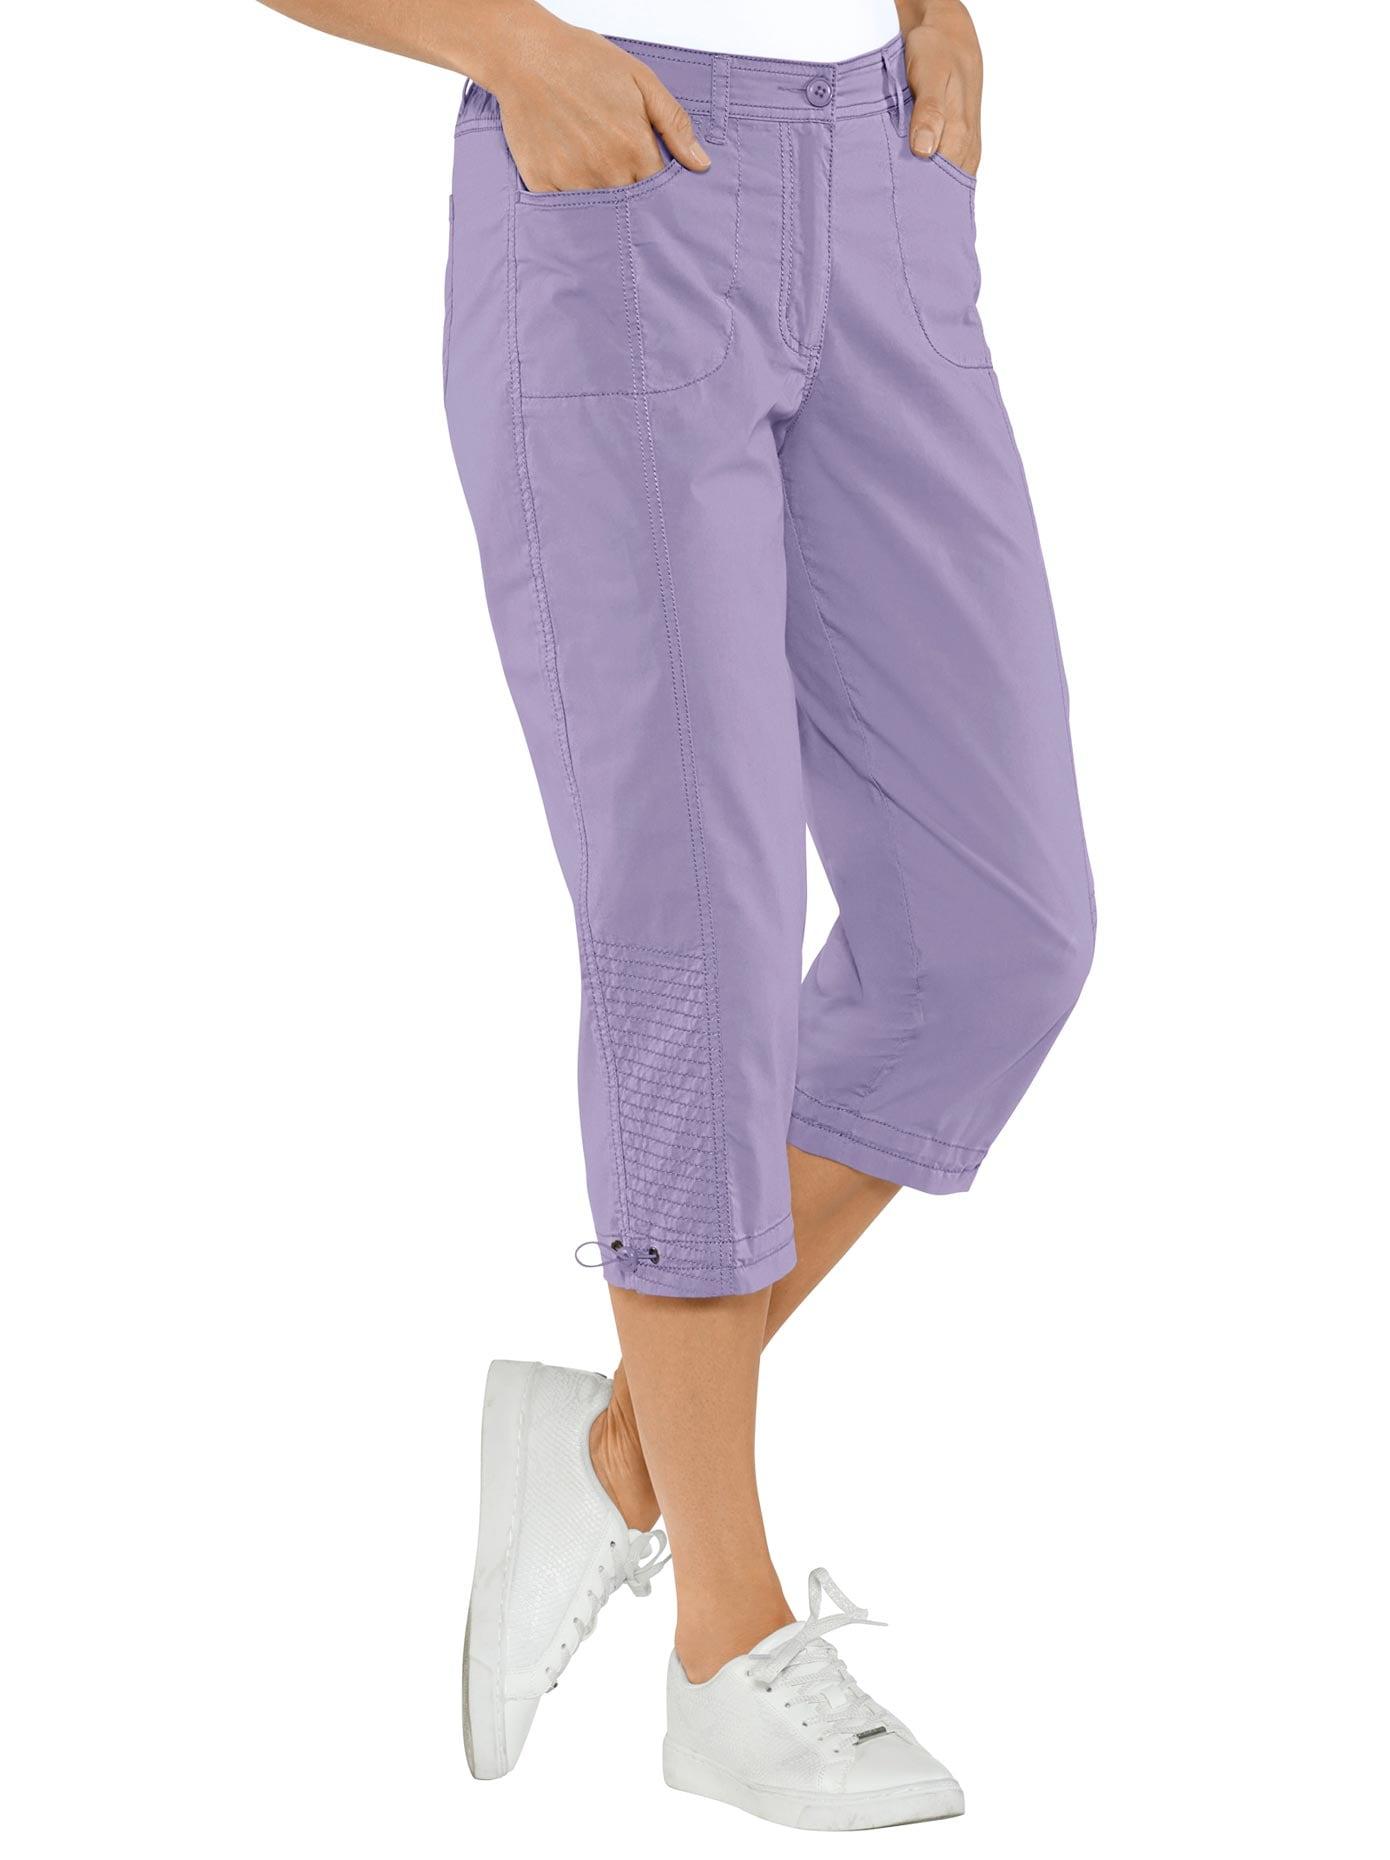 Casual Looks Capri-Hose mit rückwärtigem Dehnbund | Bekleidung > Hosen > Caprihosen | Lila | Casual Looks